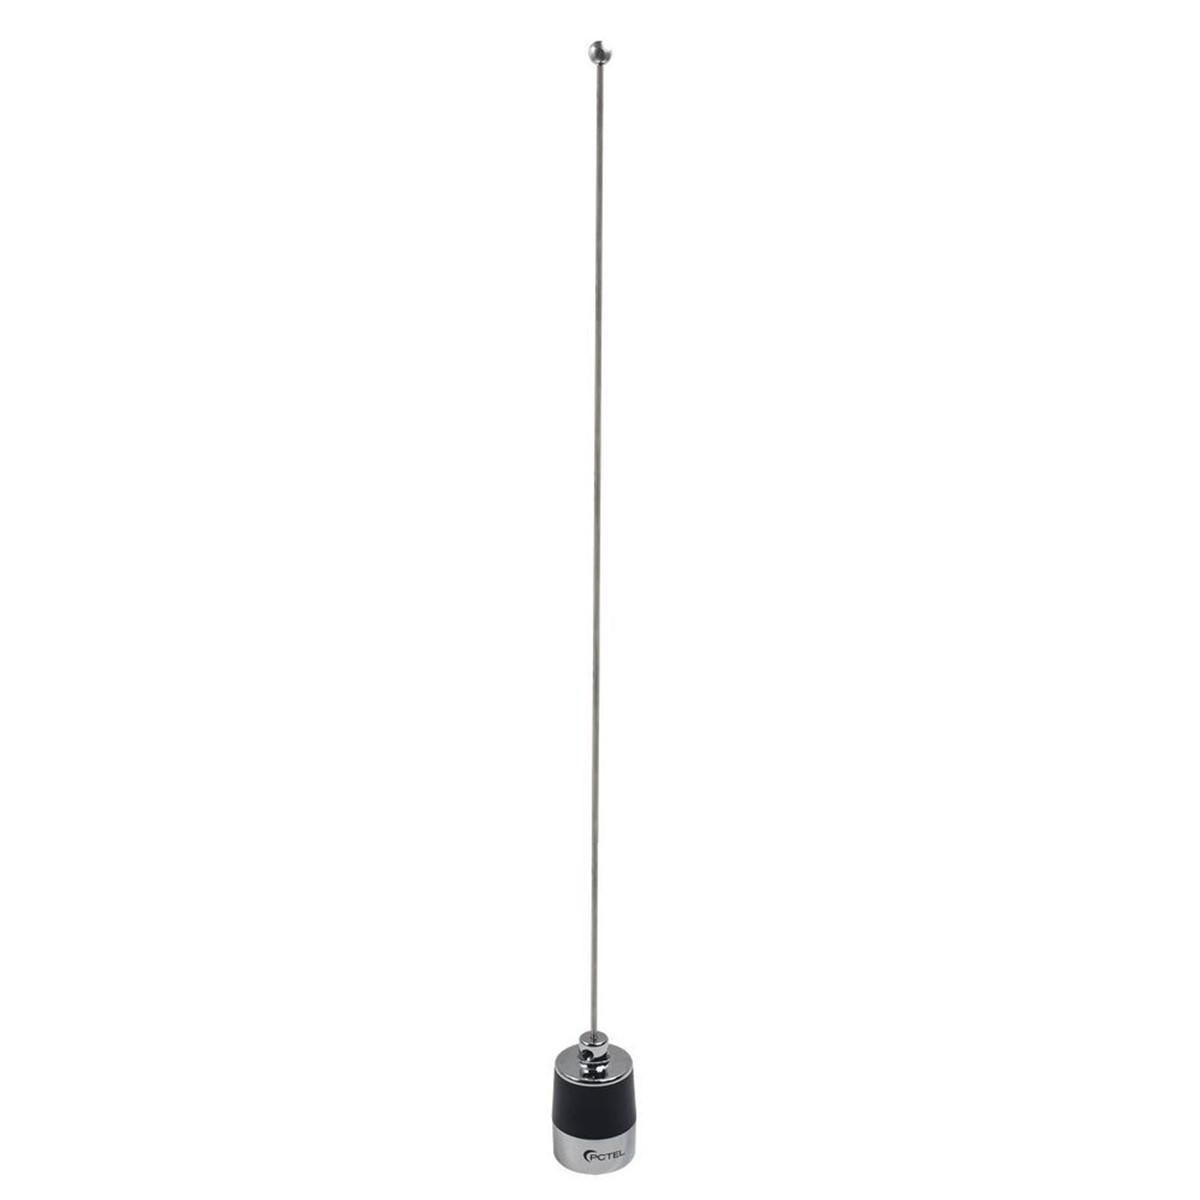 Antena Pctel para radio base VHF 144-174 MHz tipo látigo MHB-5800